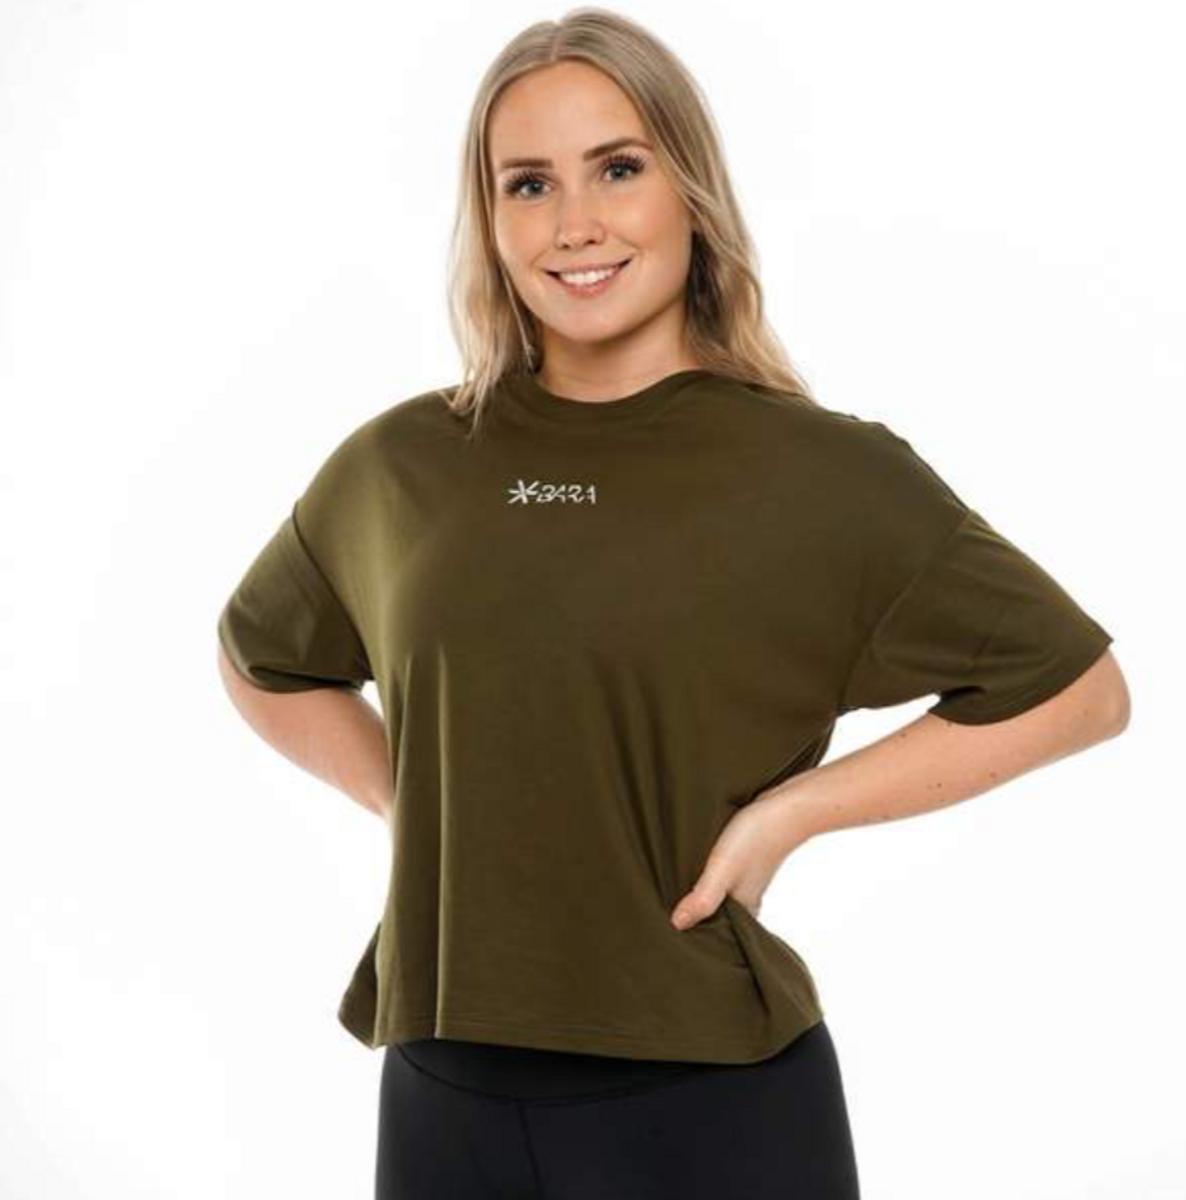 BARA Sportswear - Khaki Oversized Eco T-shirt